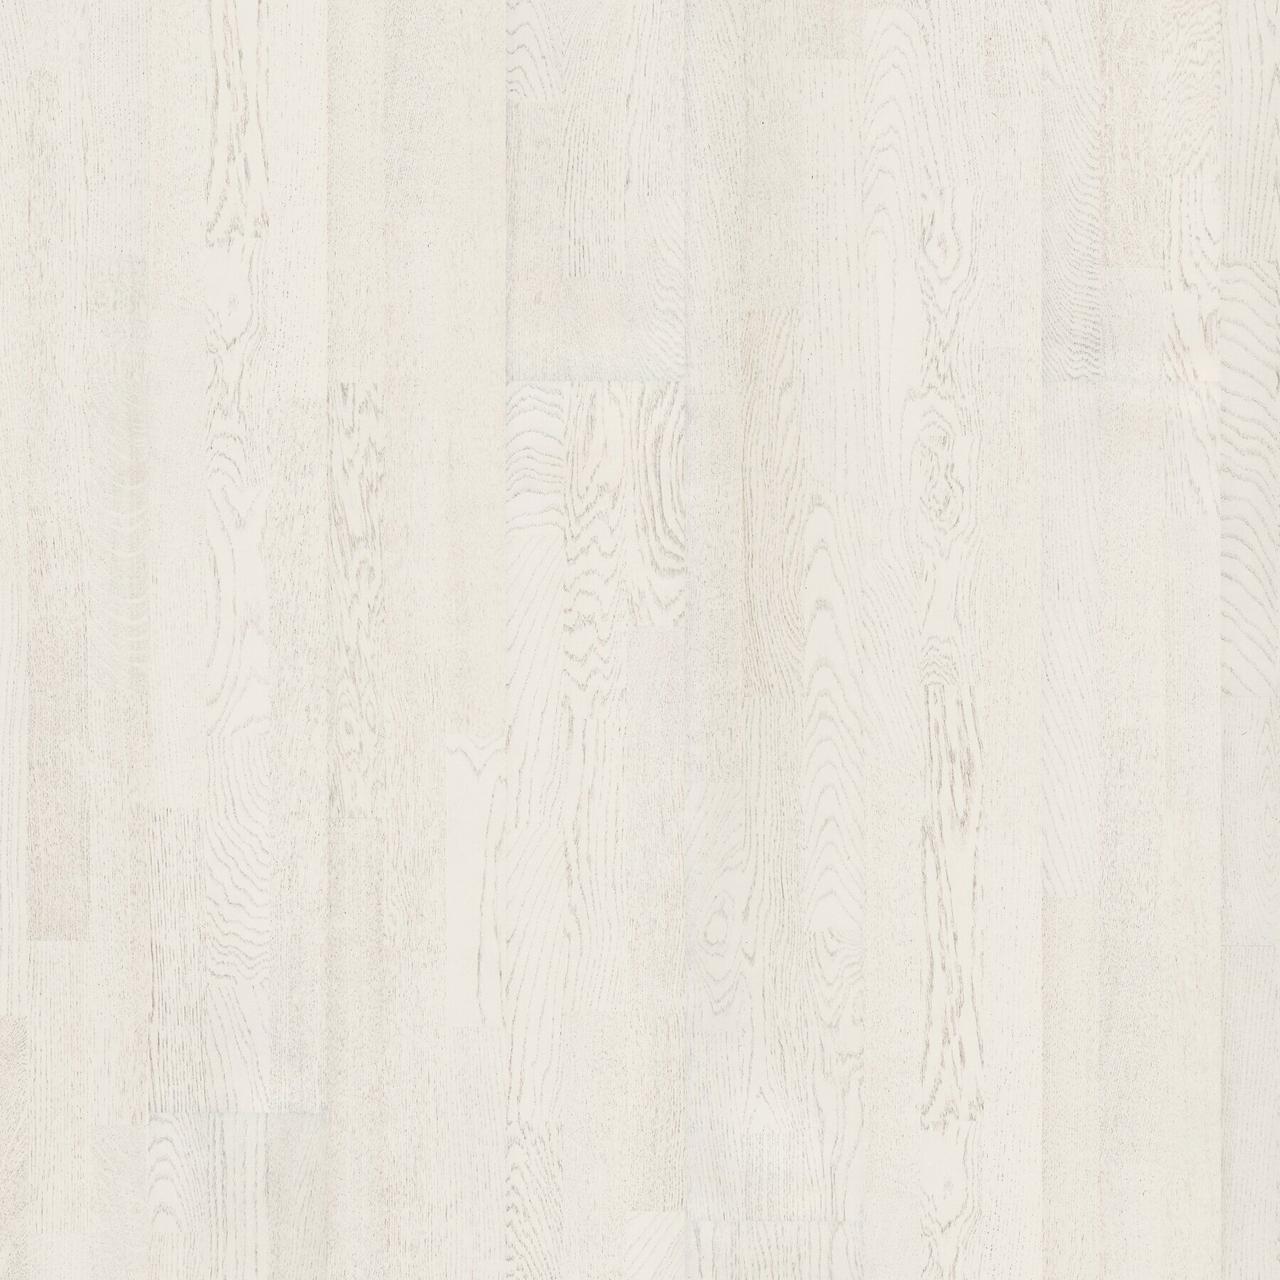 Паркет Upofloor Дуб MARBLE білий, натуральный , снежно-белый лак